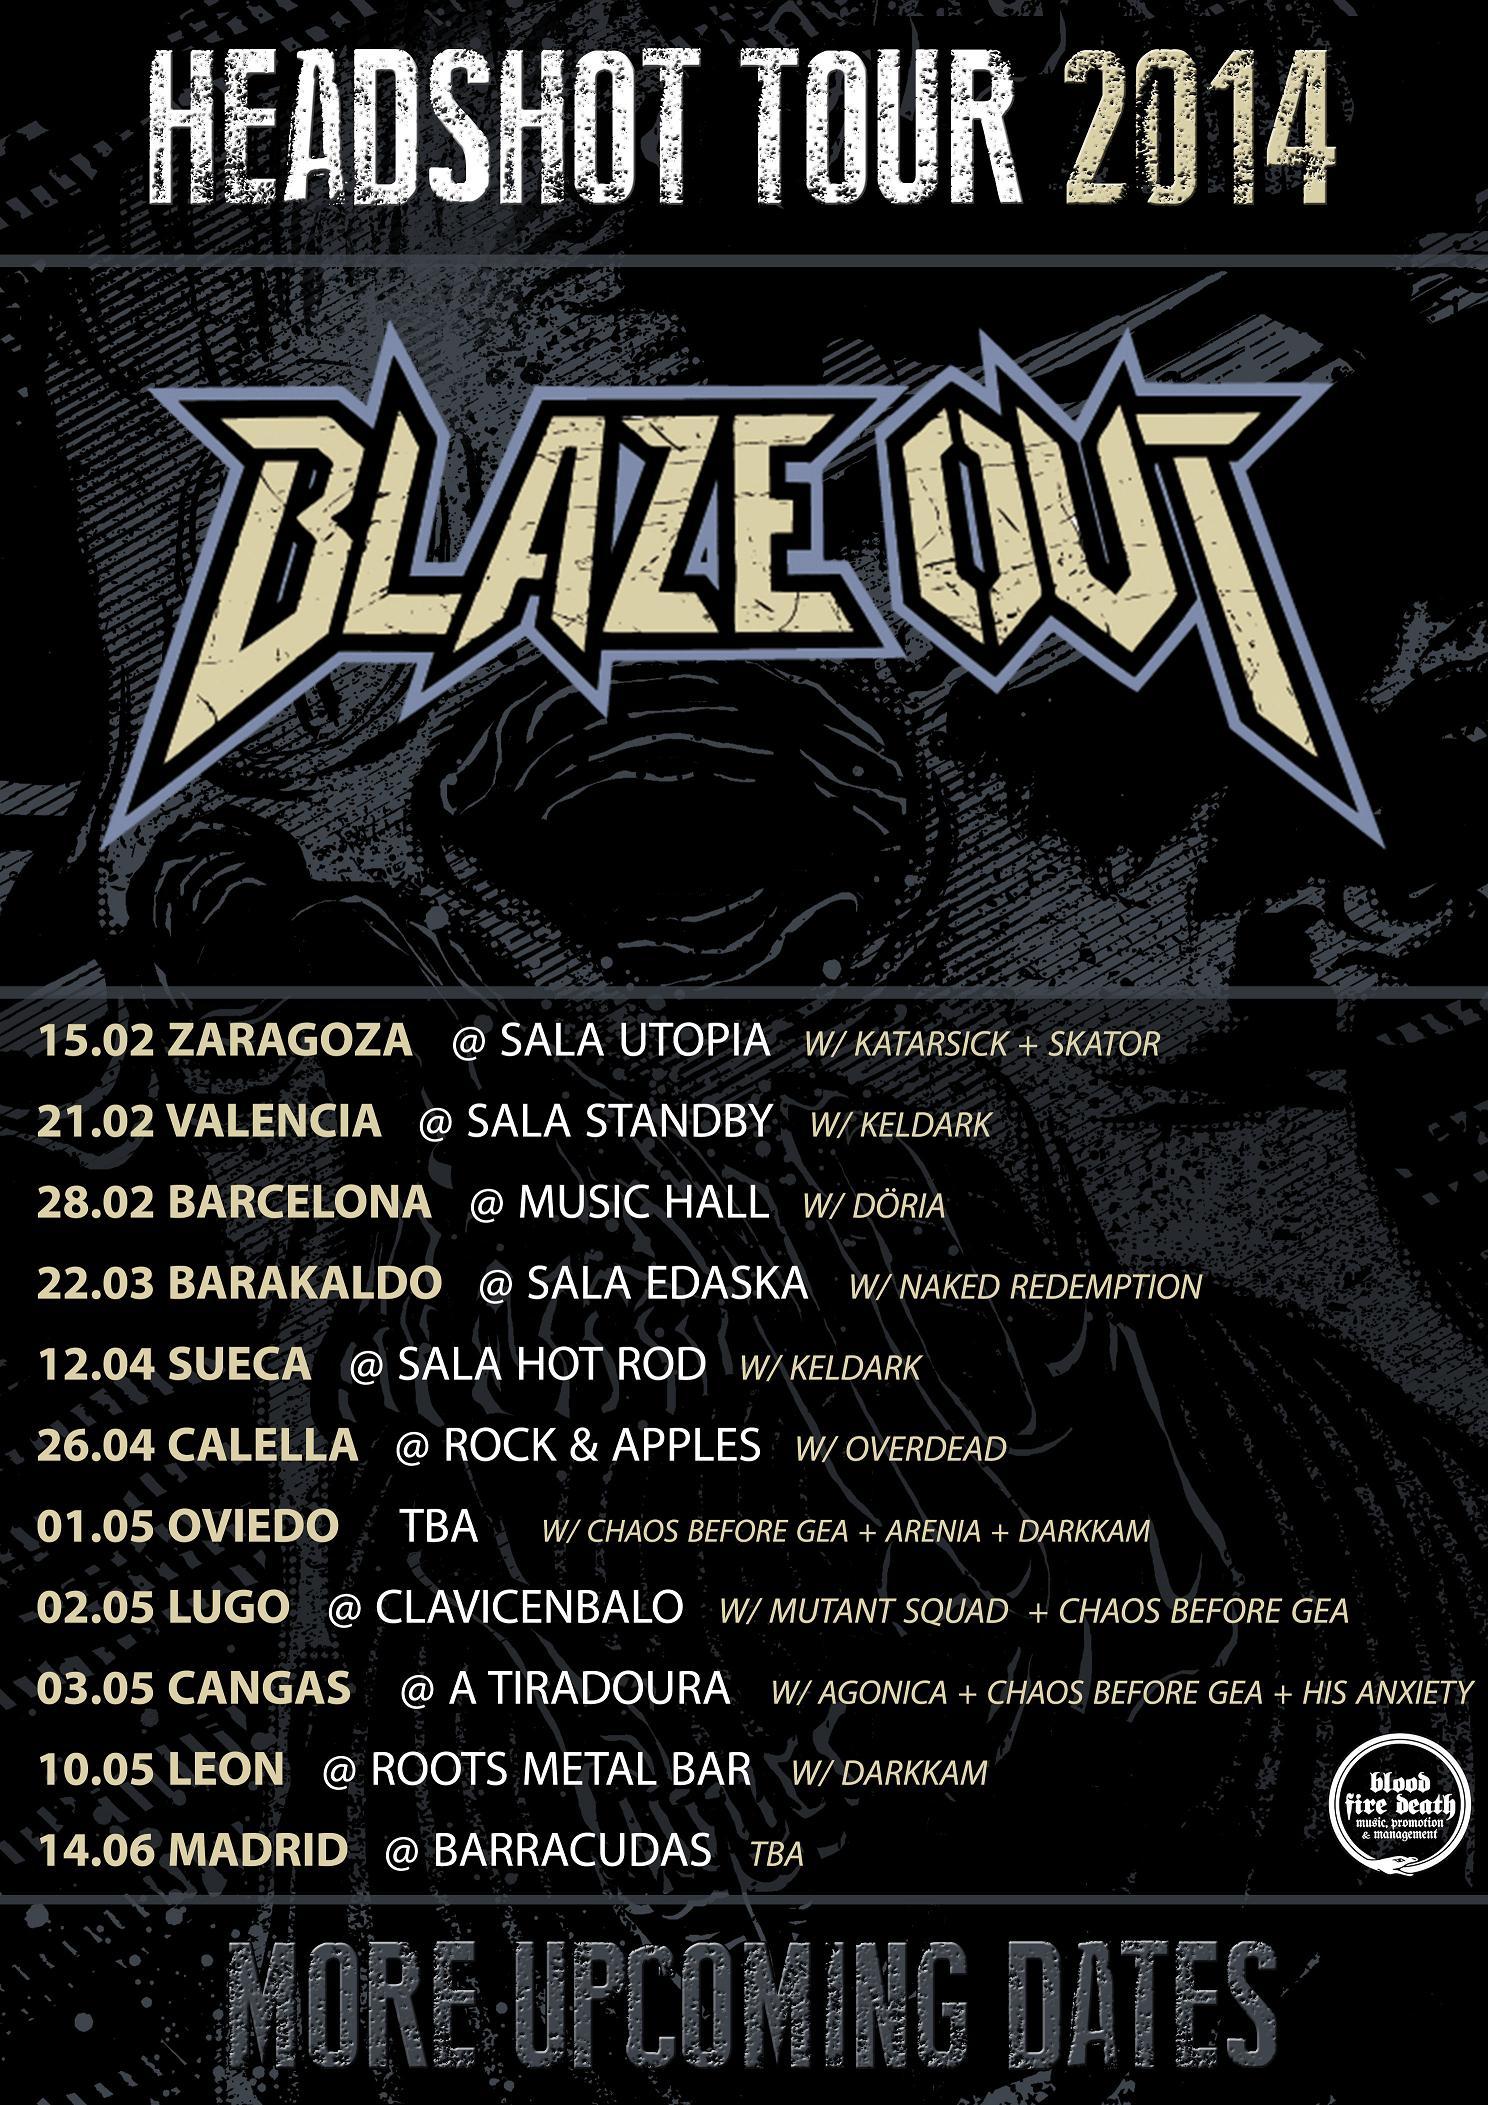 BLAZE OUT CON SU GIRA HEADSHOT TOUR 2014